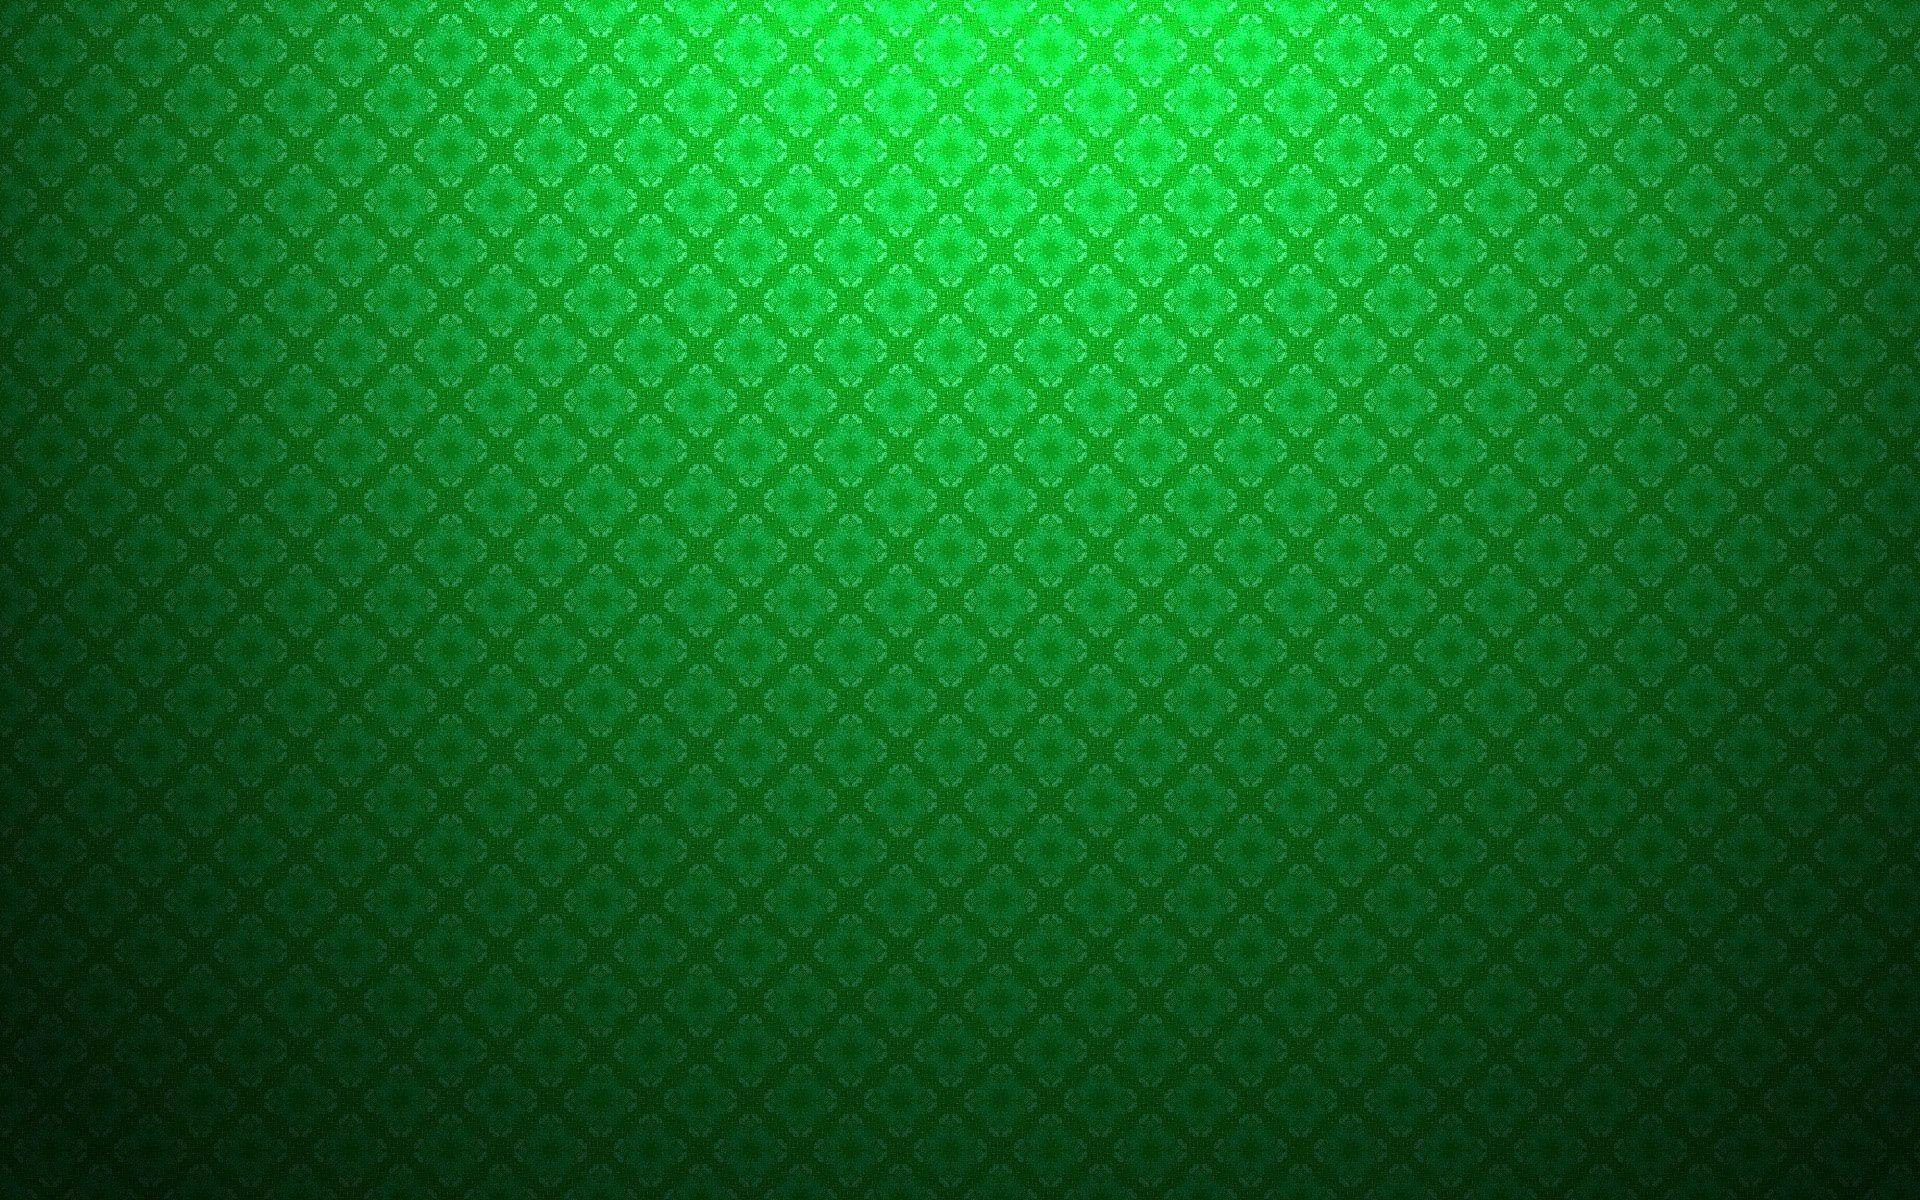 Green background wallpaper wallpapersafari for Green wallpaper